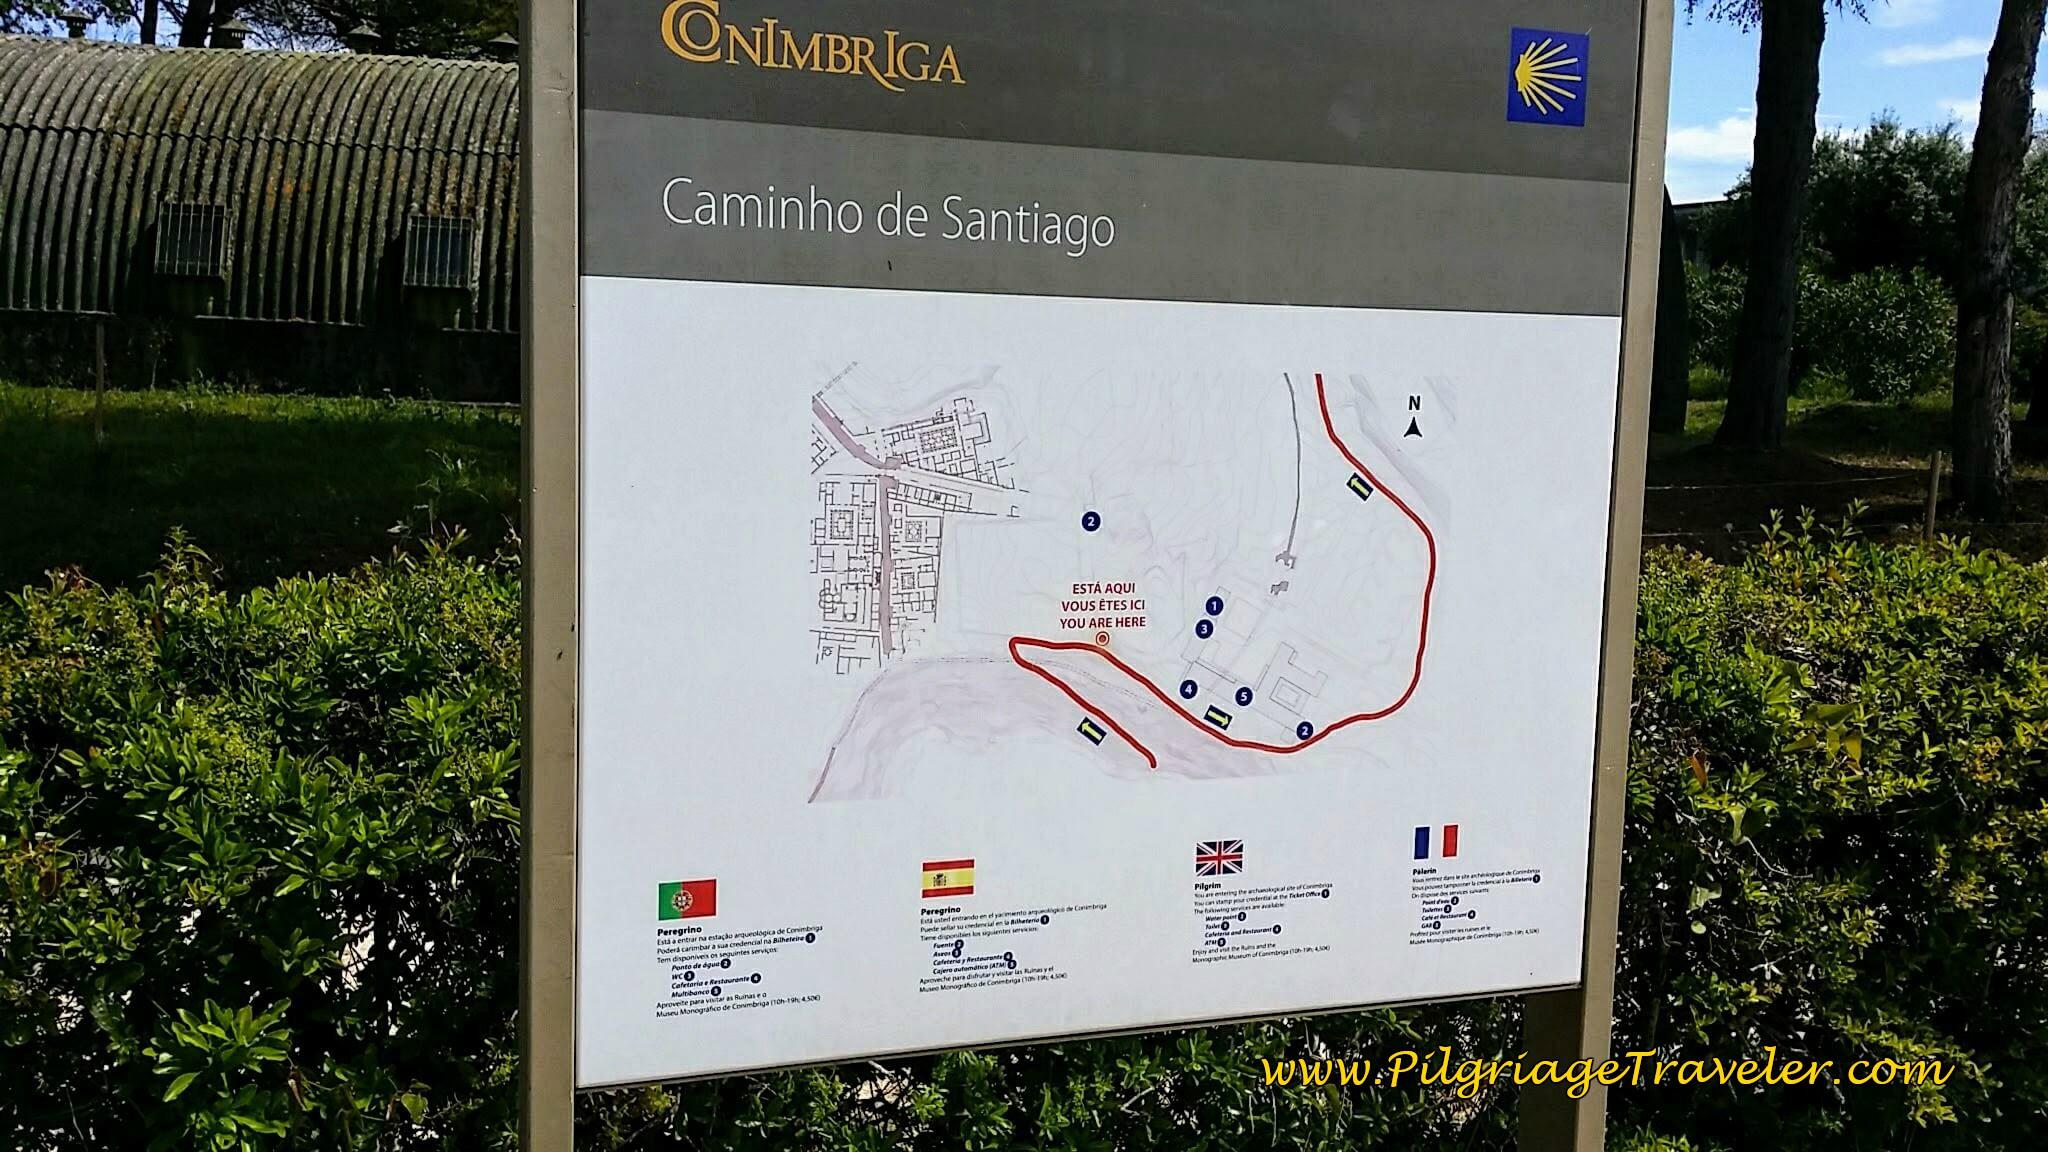 Entering Roman Ruins of Conimbriga